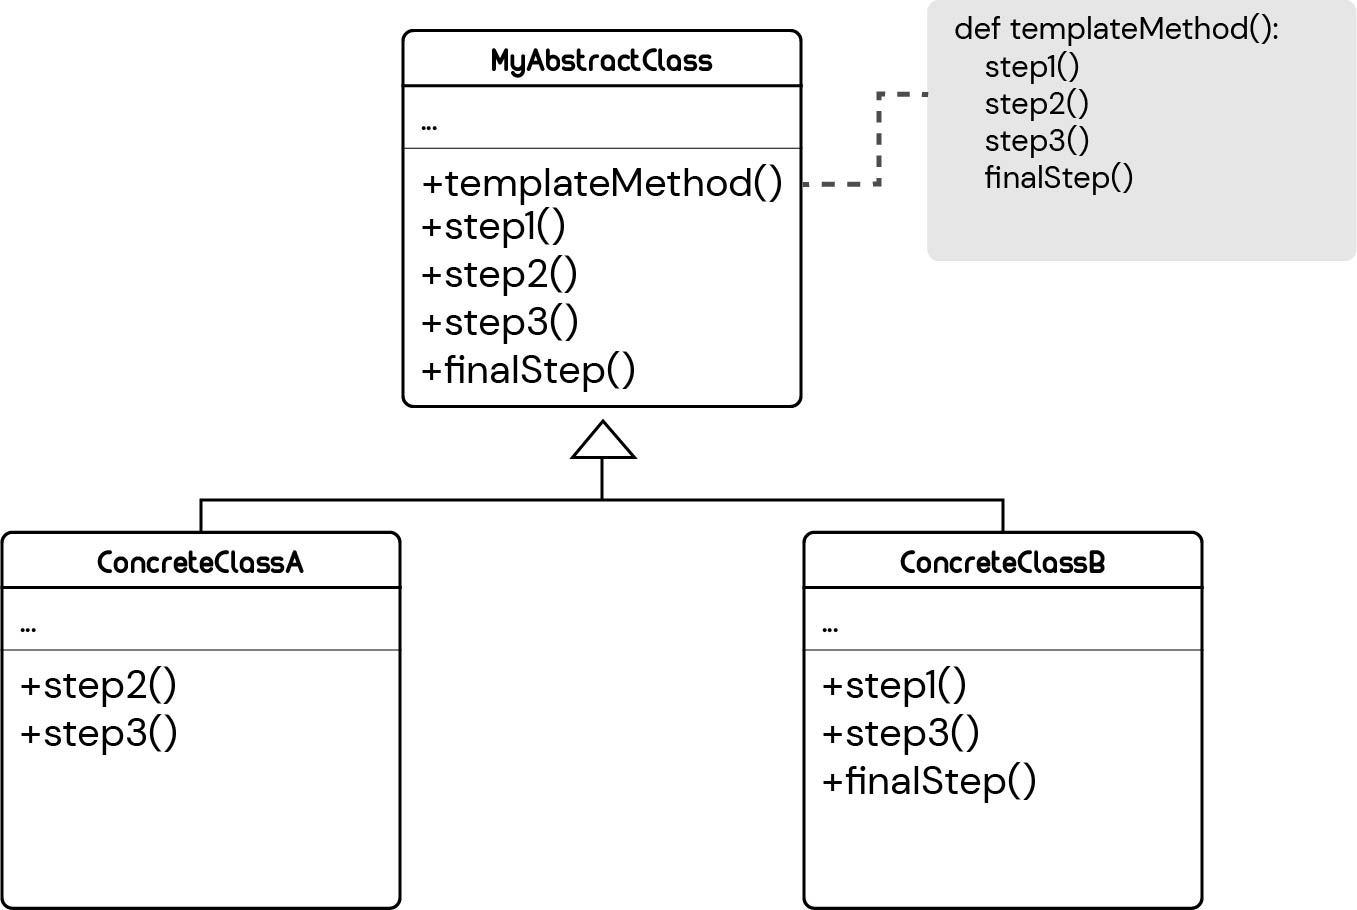 UML diagram of the template method design pattern